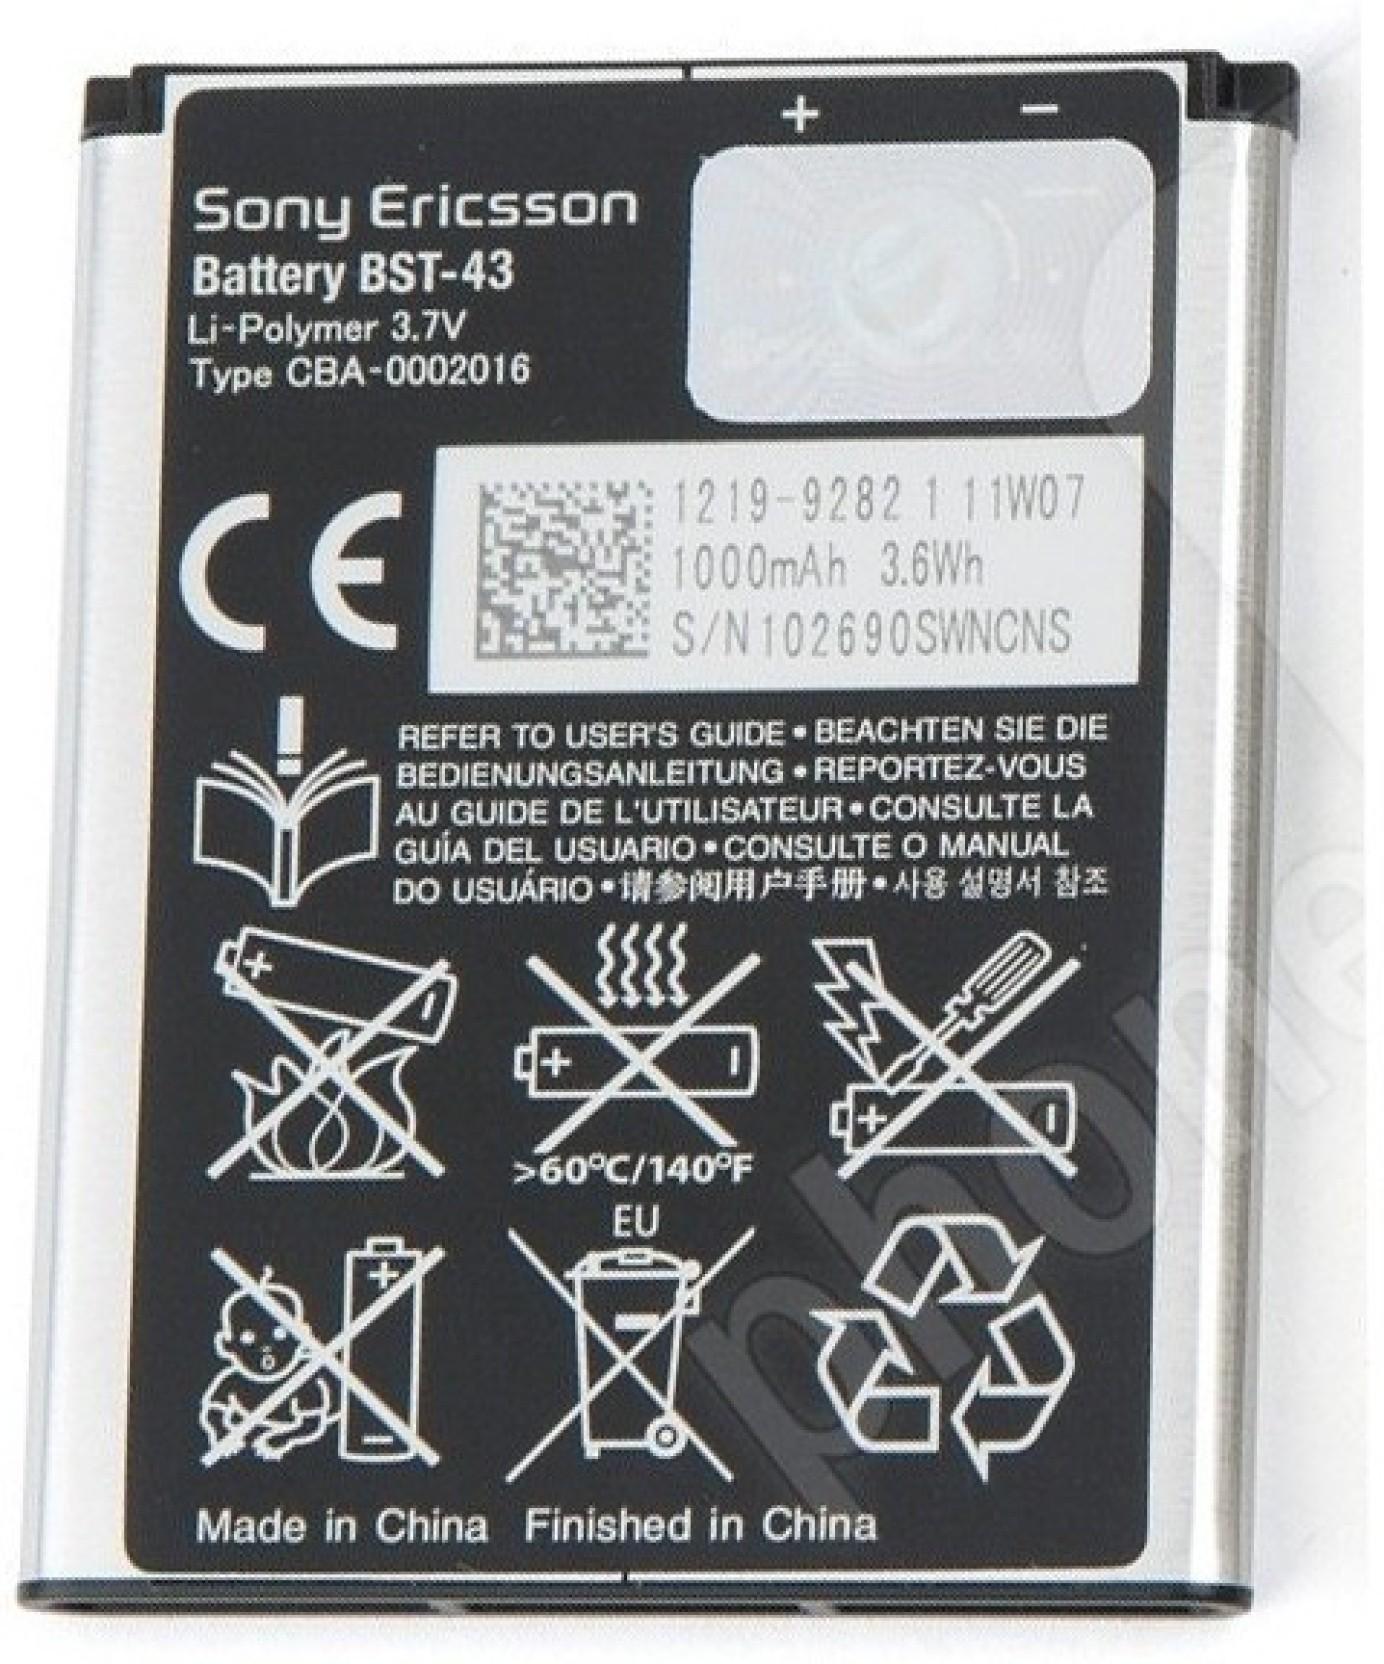 Sony Mobile Battery For BST-43 Battery. Share